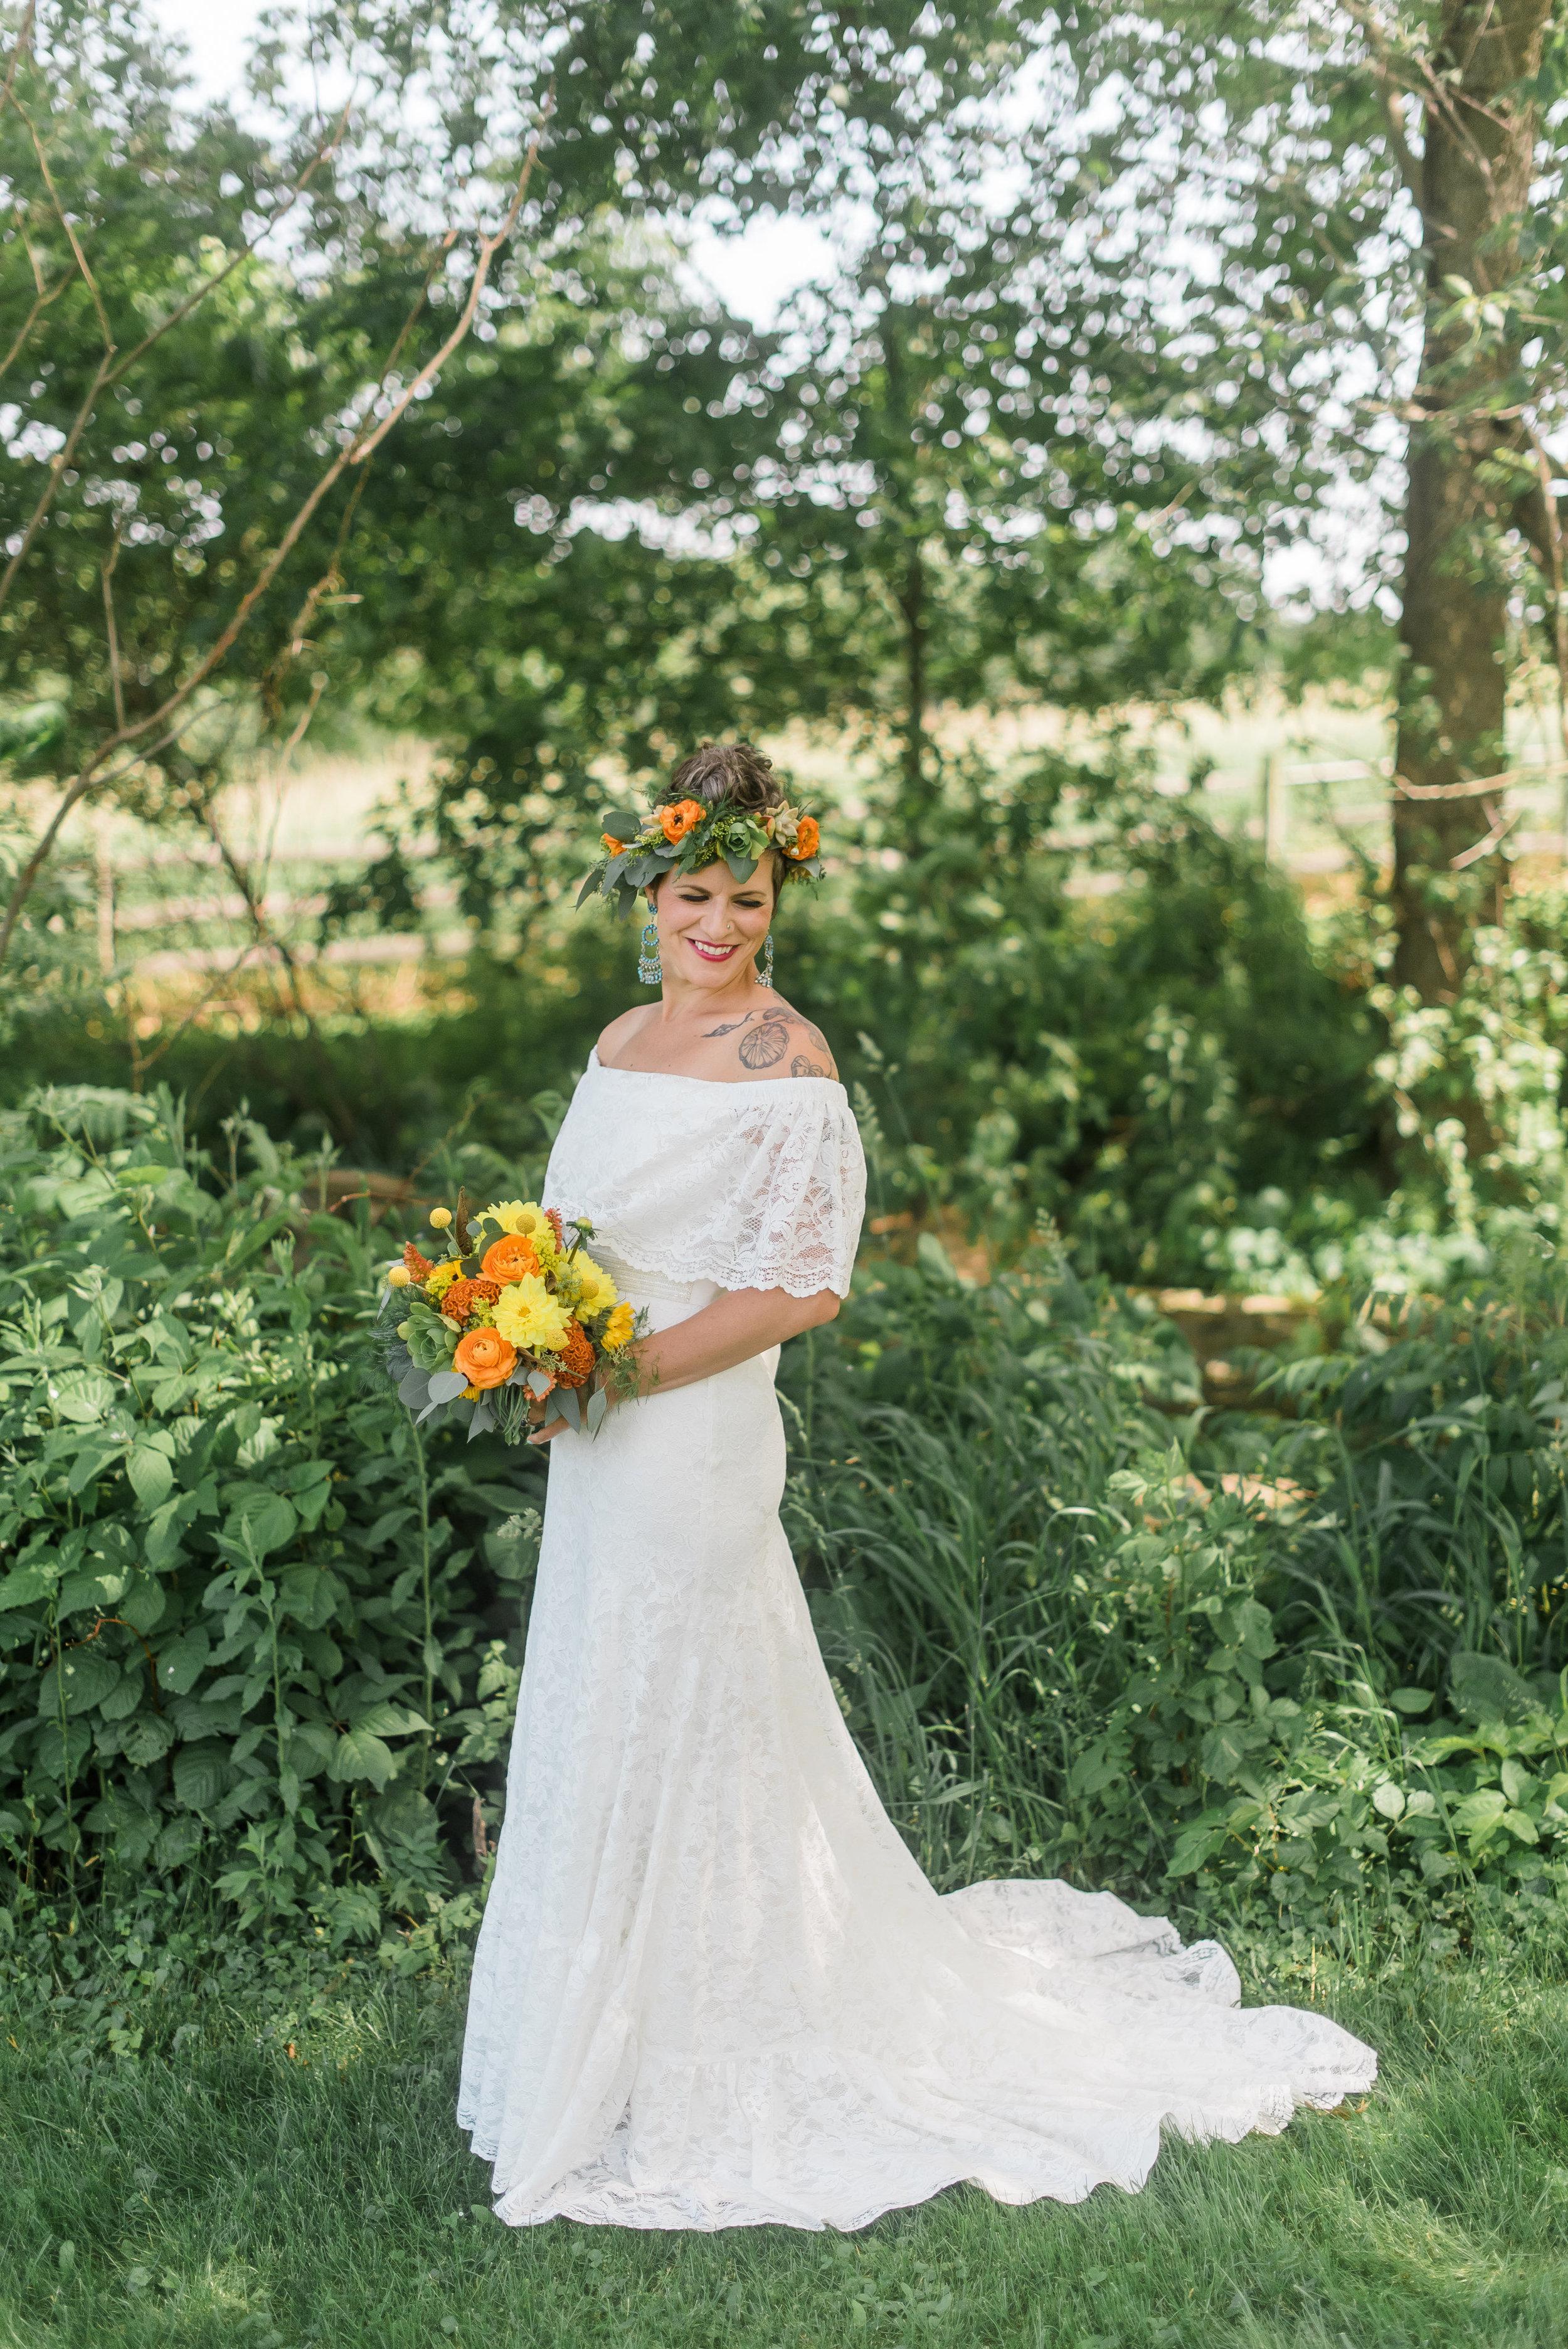 pittsburgh-wedding-photographer-armstrongfarms-eclectic-offbeat-boho0144.jpg